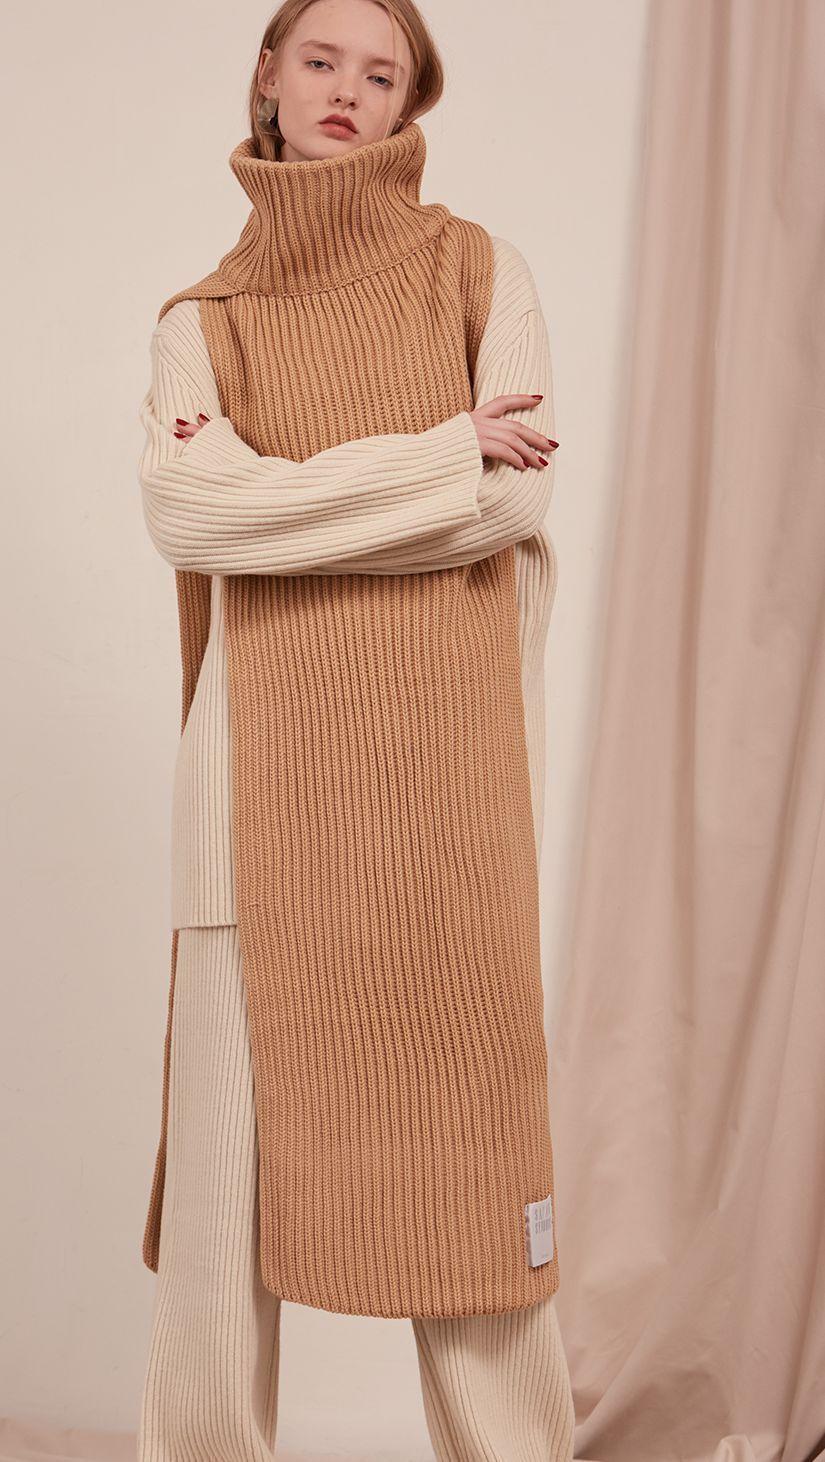 Photo of #Cowl #Knitting Fashion Design #Sancia #Scarf Sancia Cowl Schal Sancia Cowl Scar…